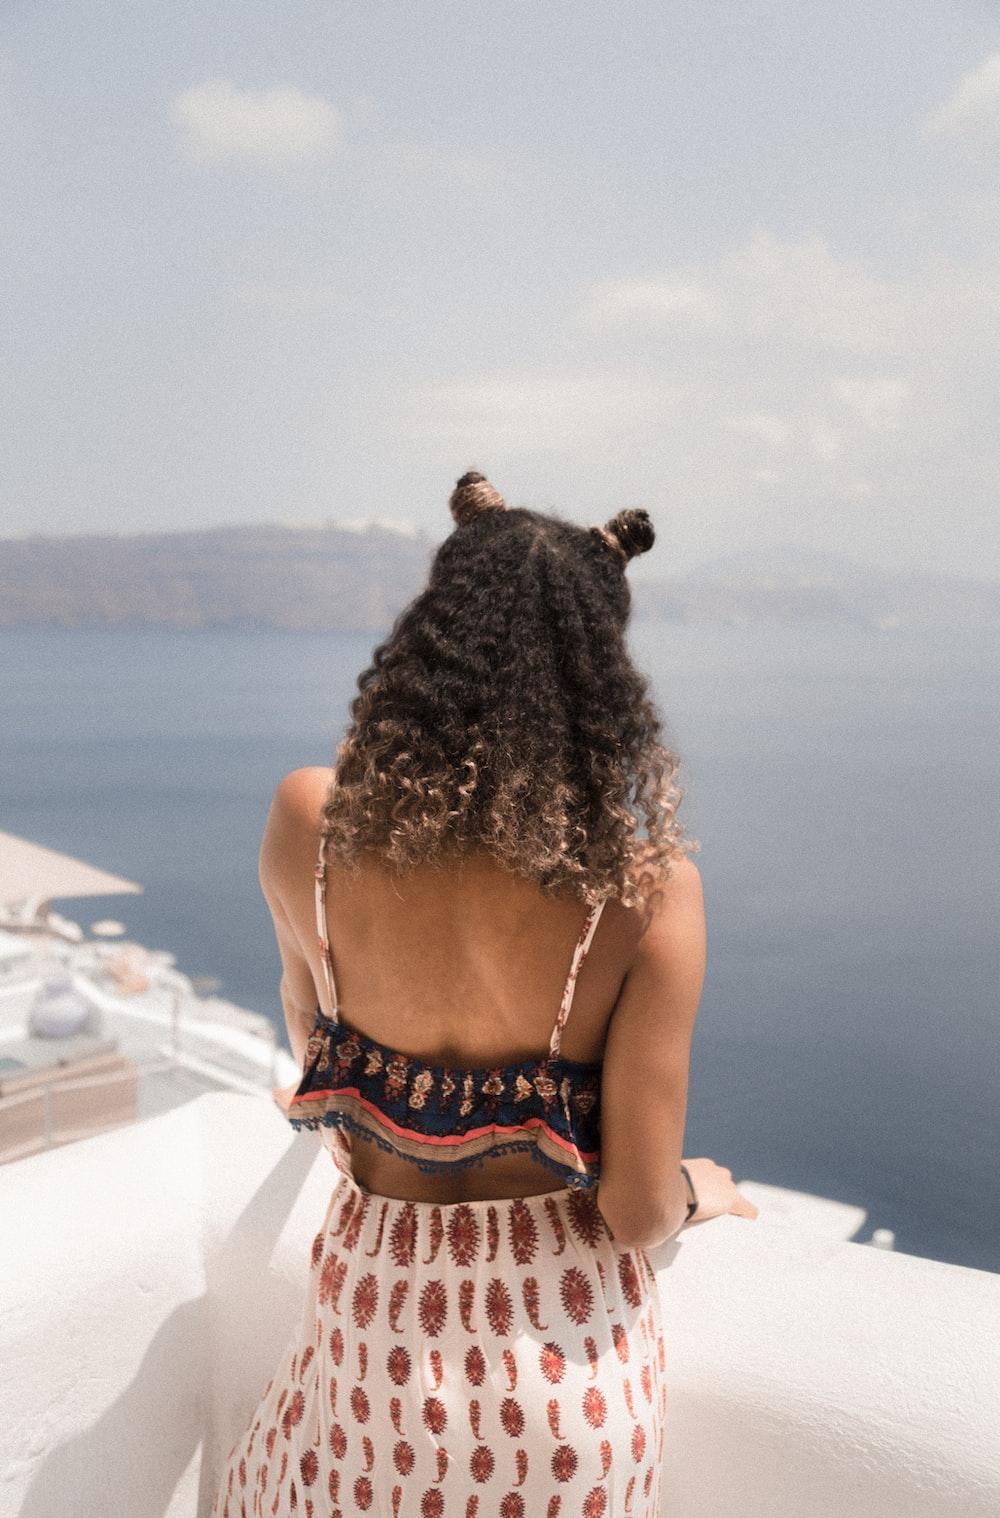 woman standing on balcony